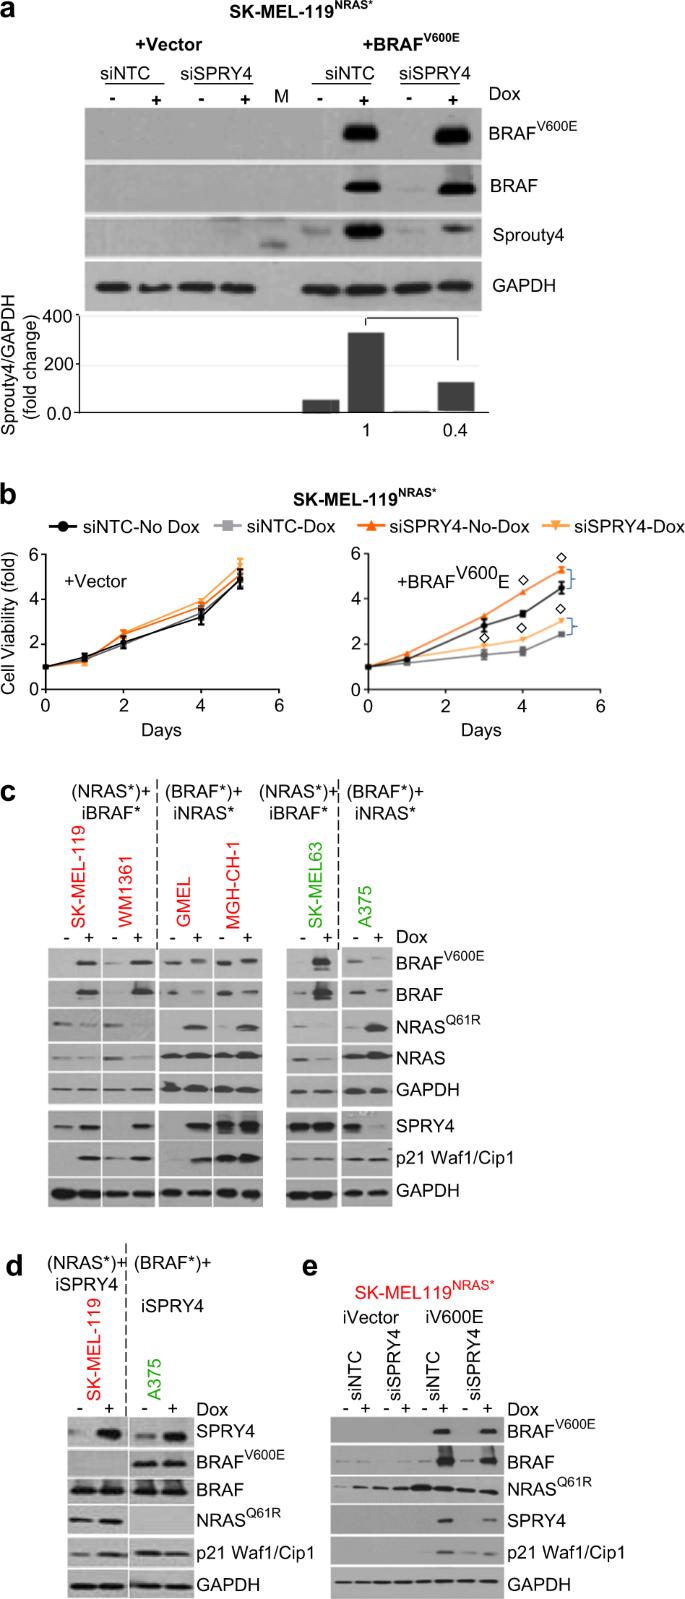 Growth suppression by dual BRAF(V600E) and NRAS(Q61) oncogene